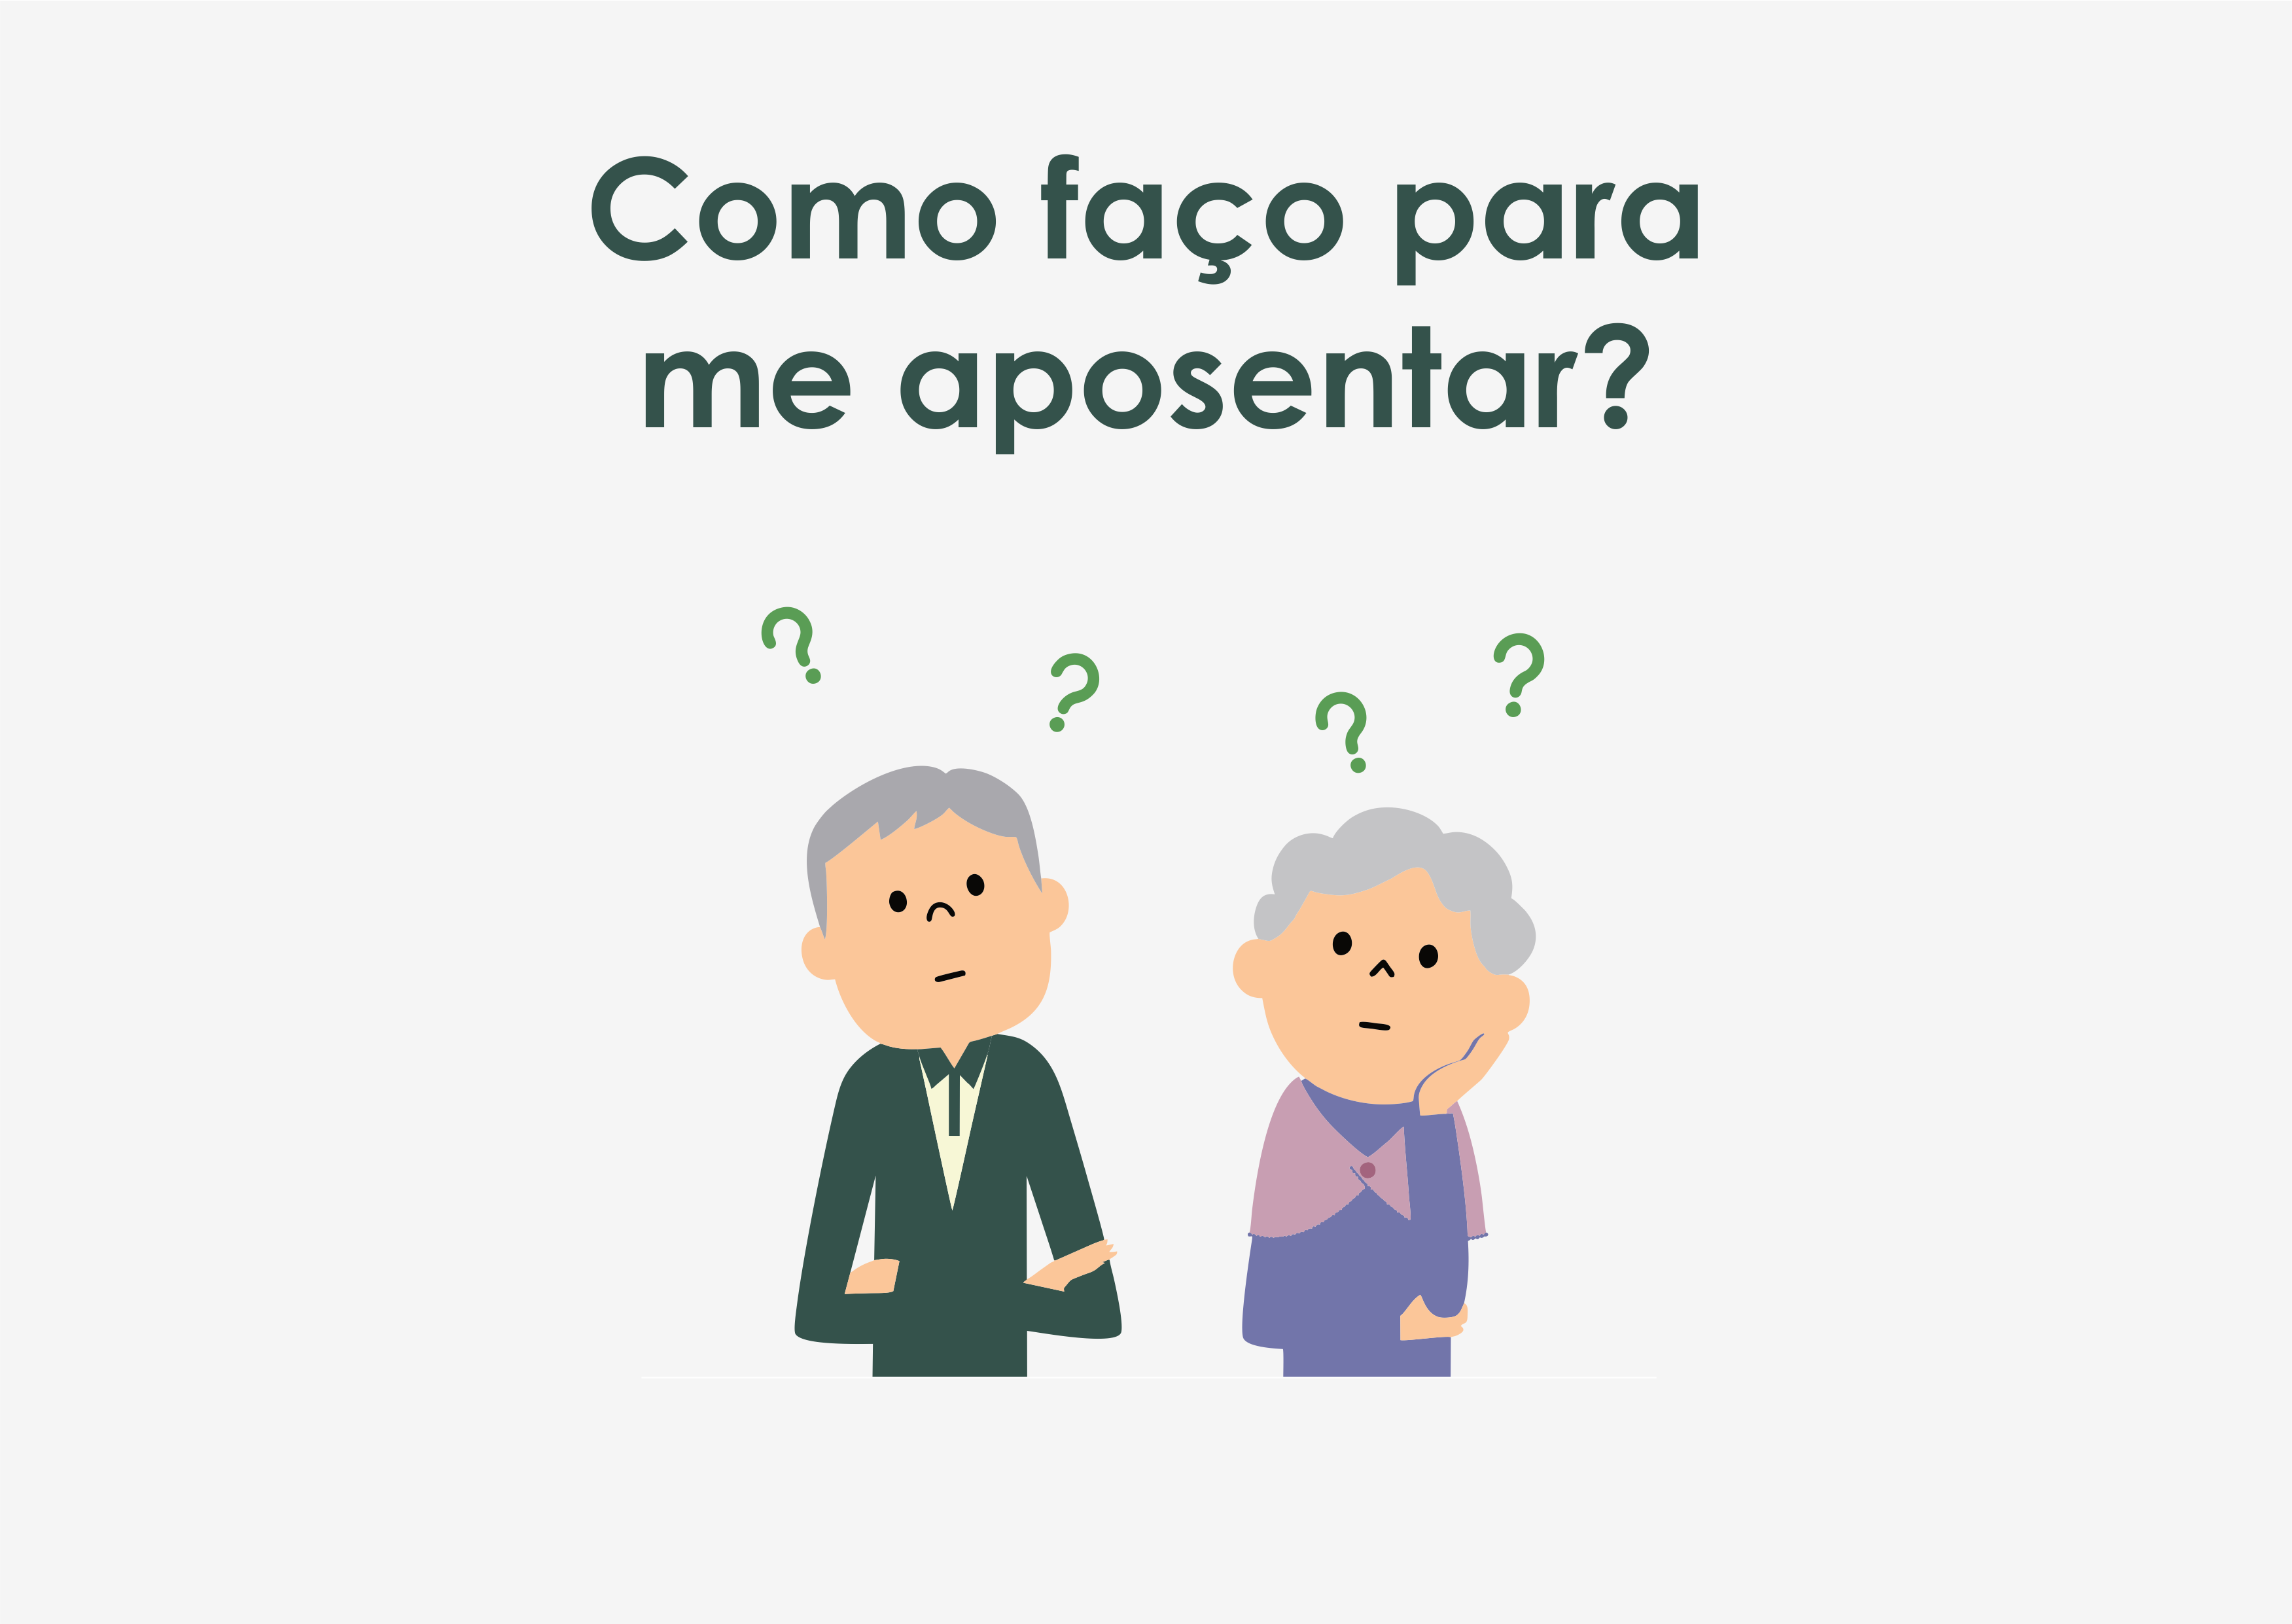 Procedimento para aposentadoria: por onde começar?